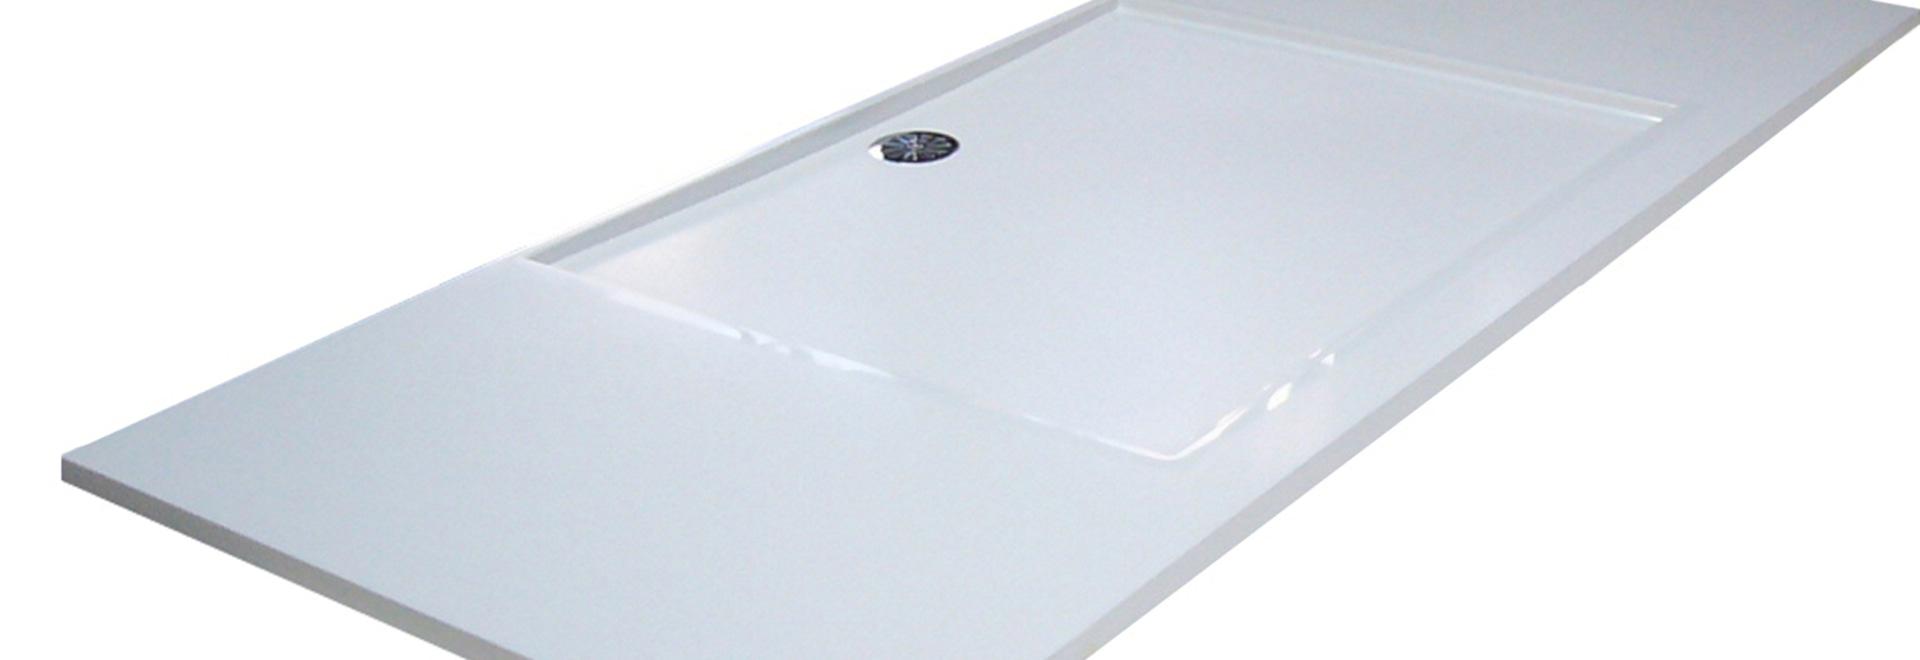 Custom Made Shower Trays In Pietraluce®